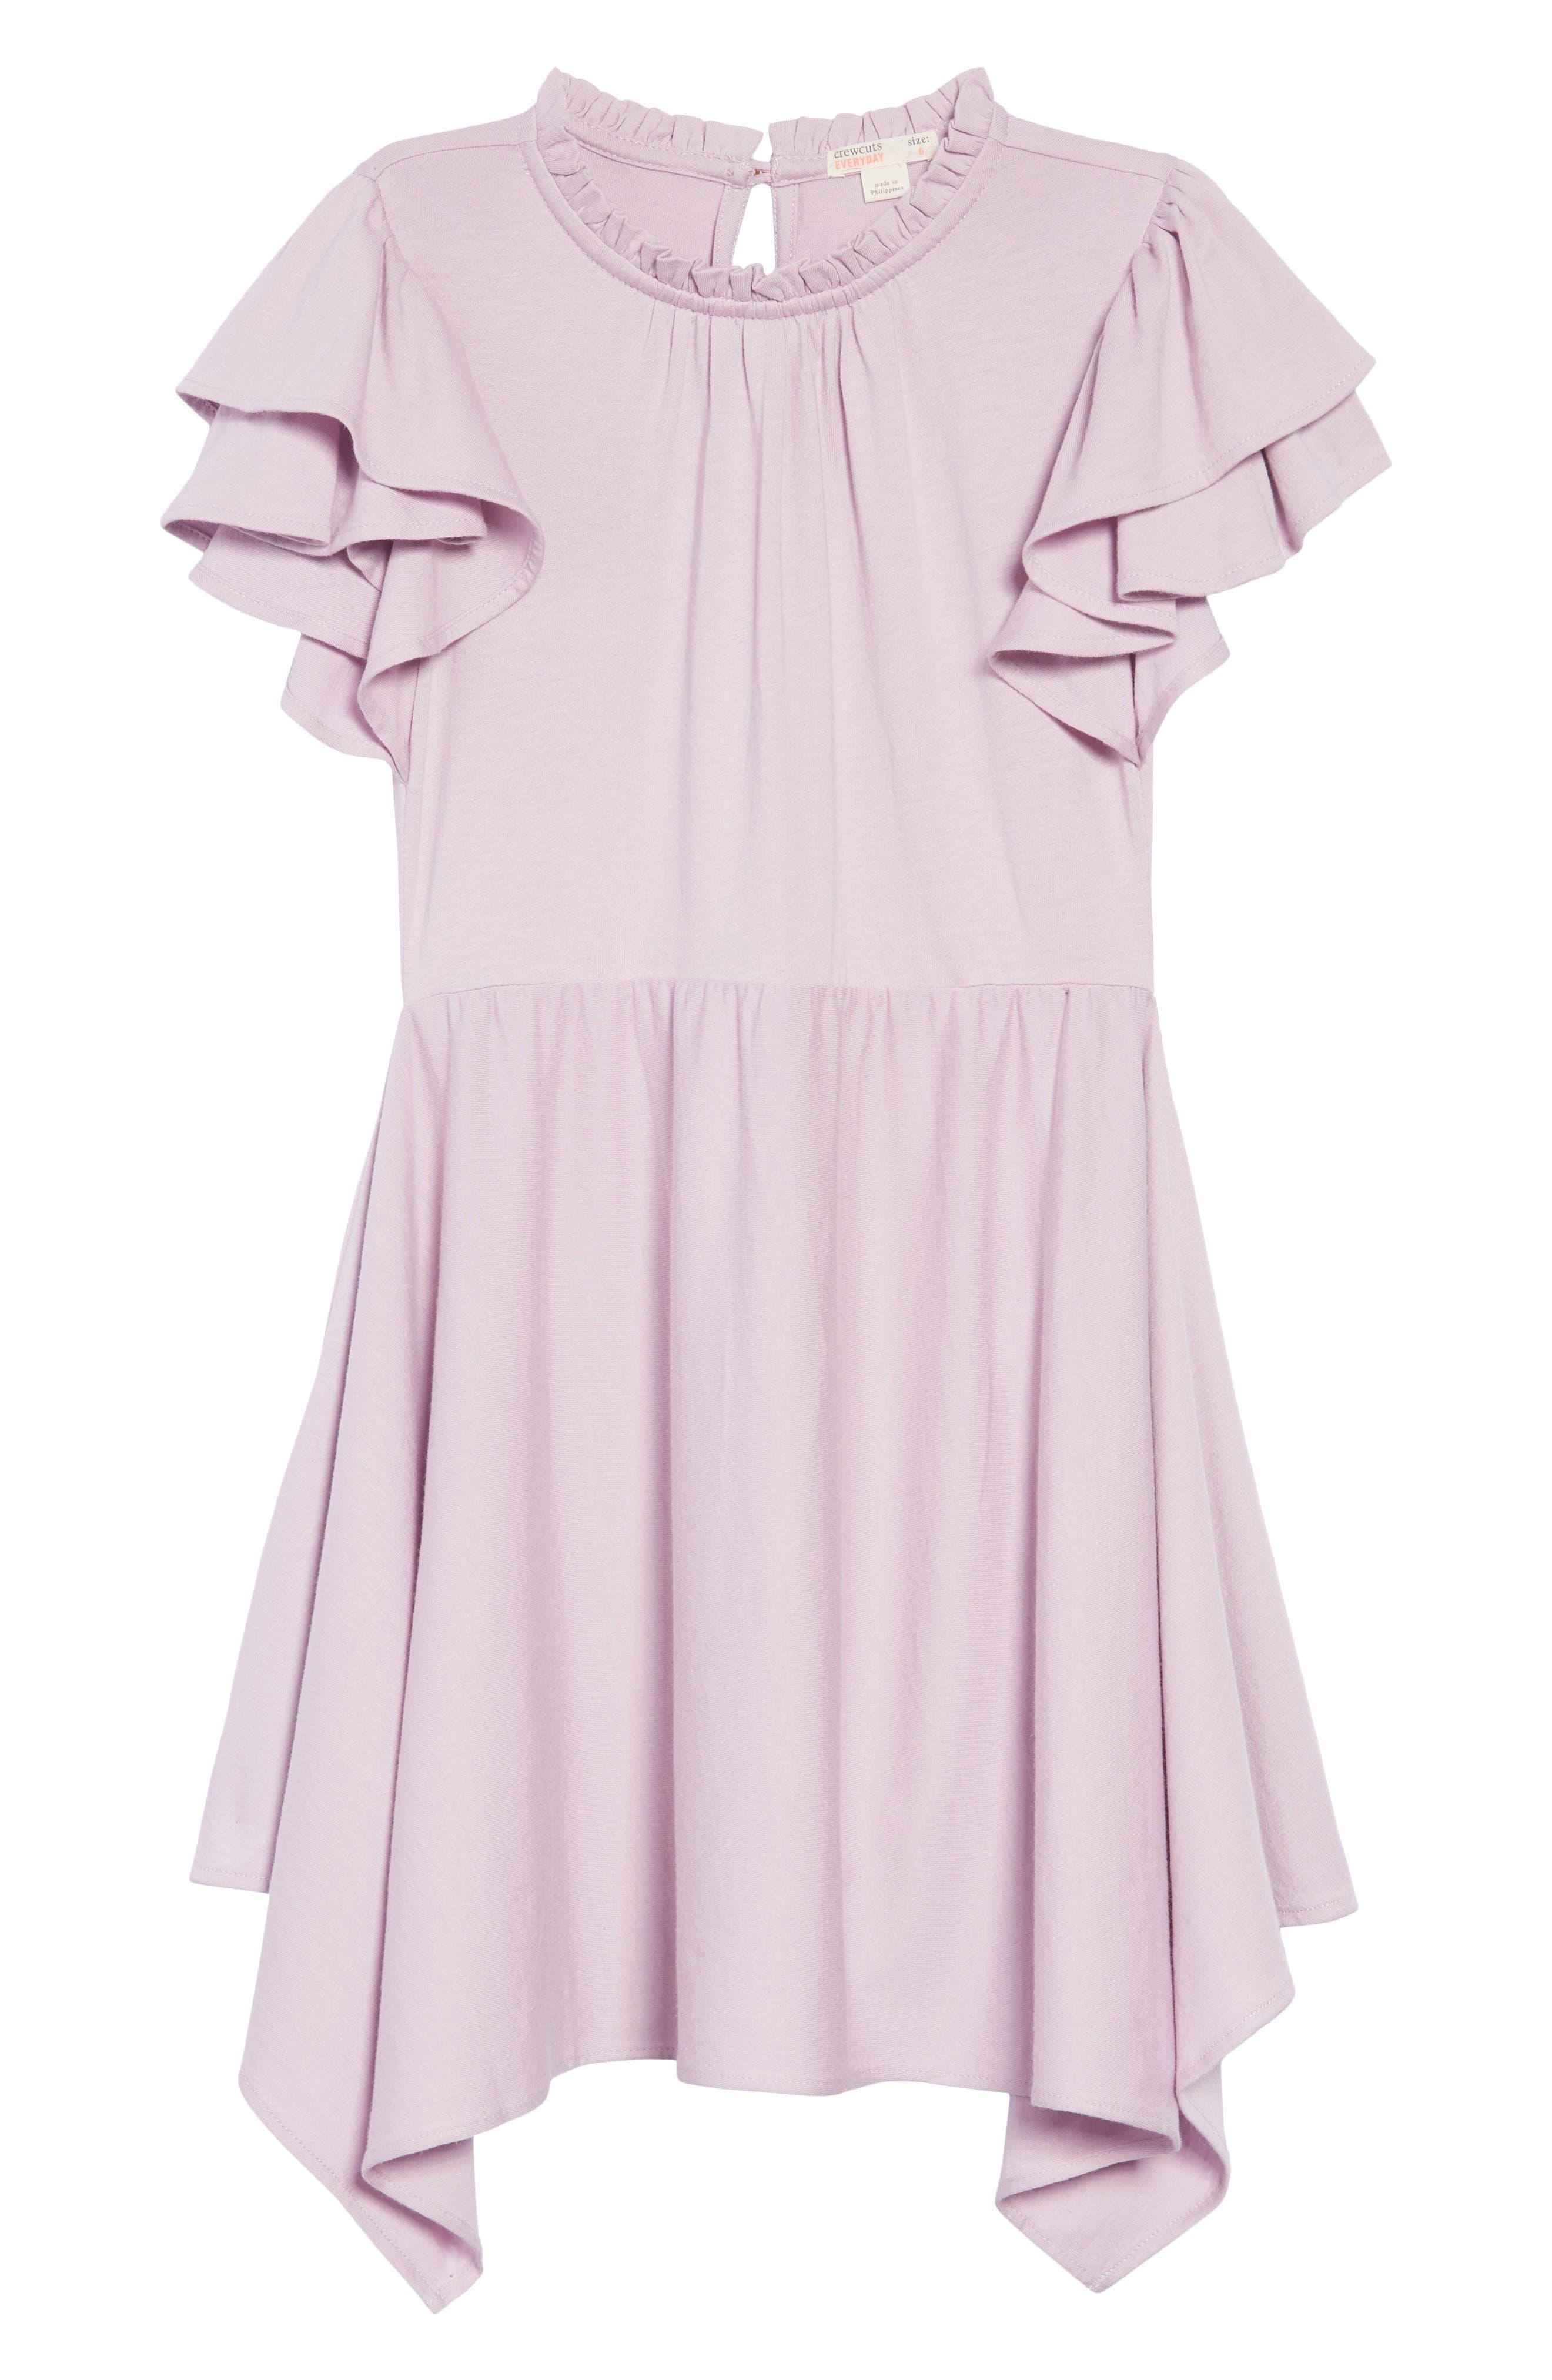 Flutter Sleeve Dress,                             Main thumbnail 1, color,                             SMOKY WISTERIA